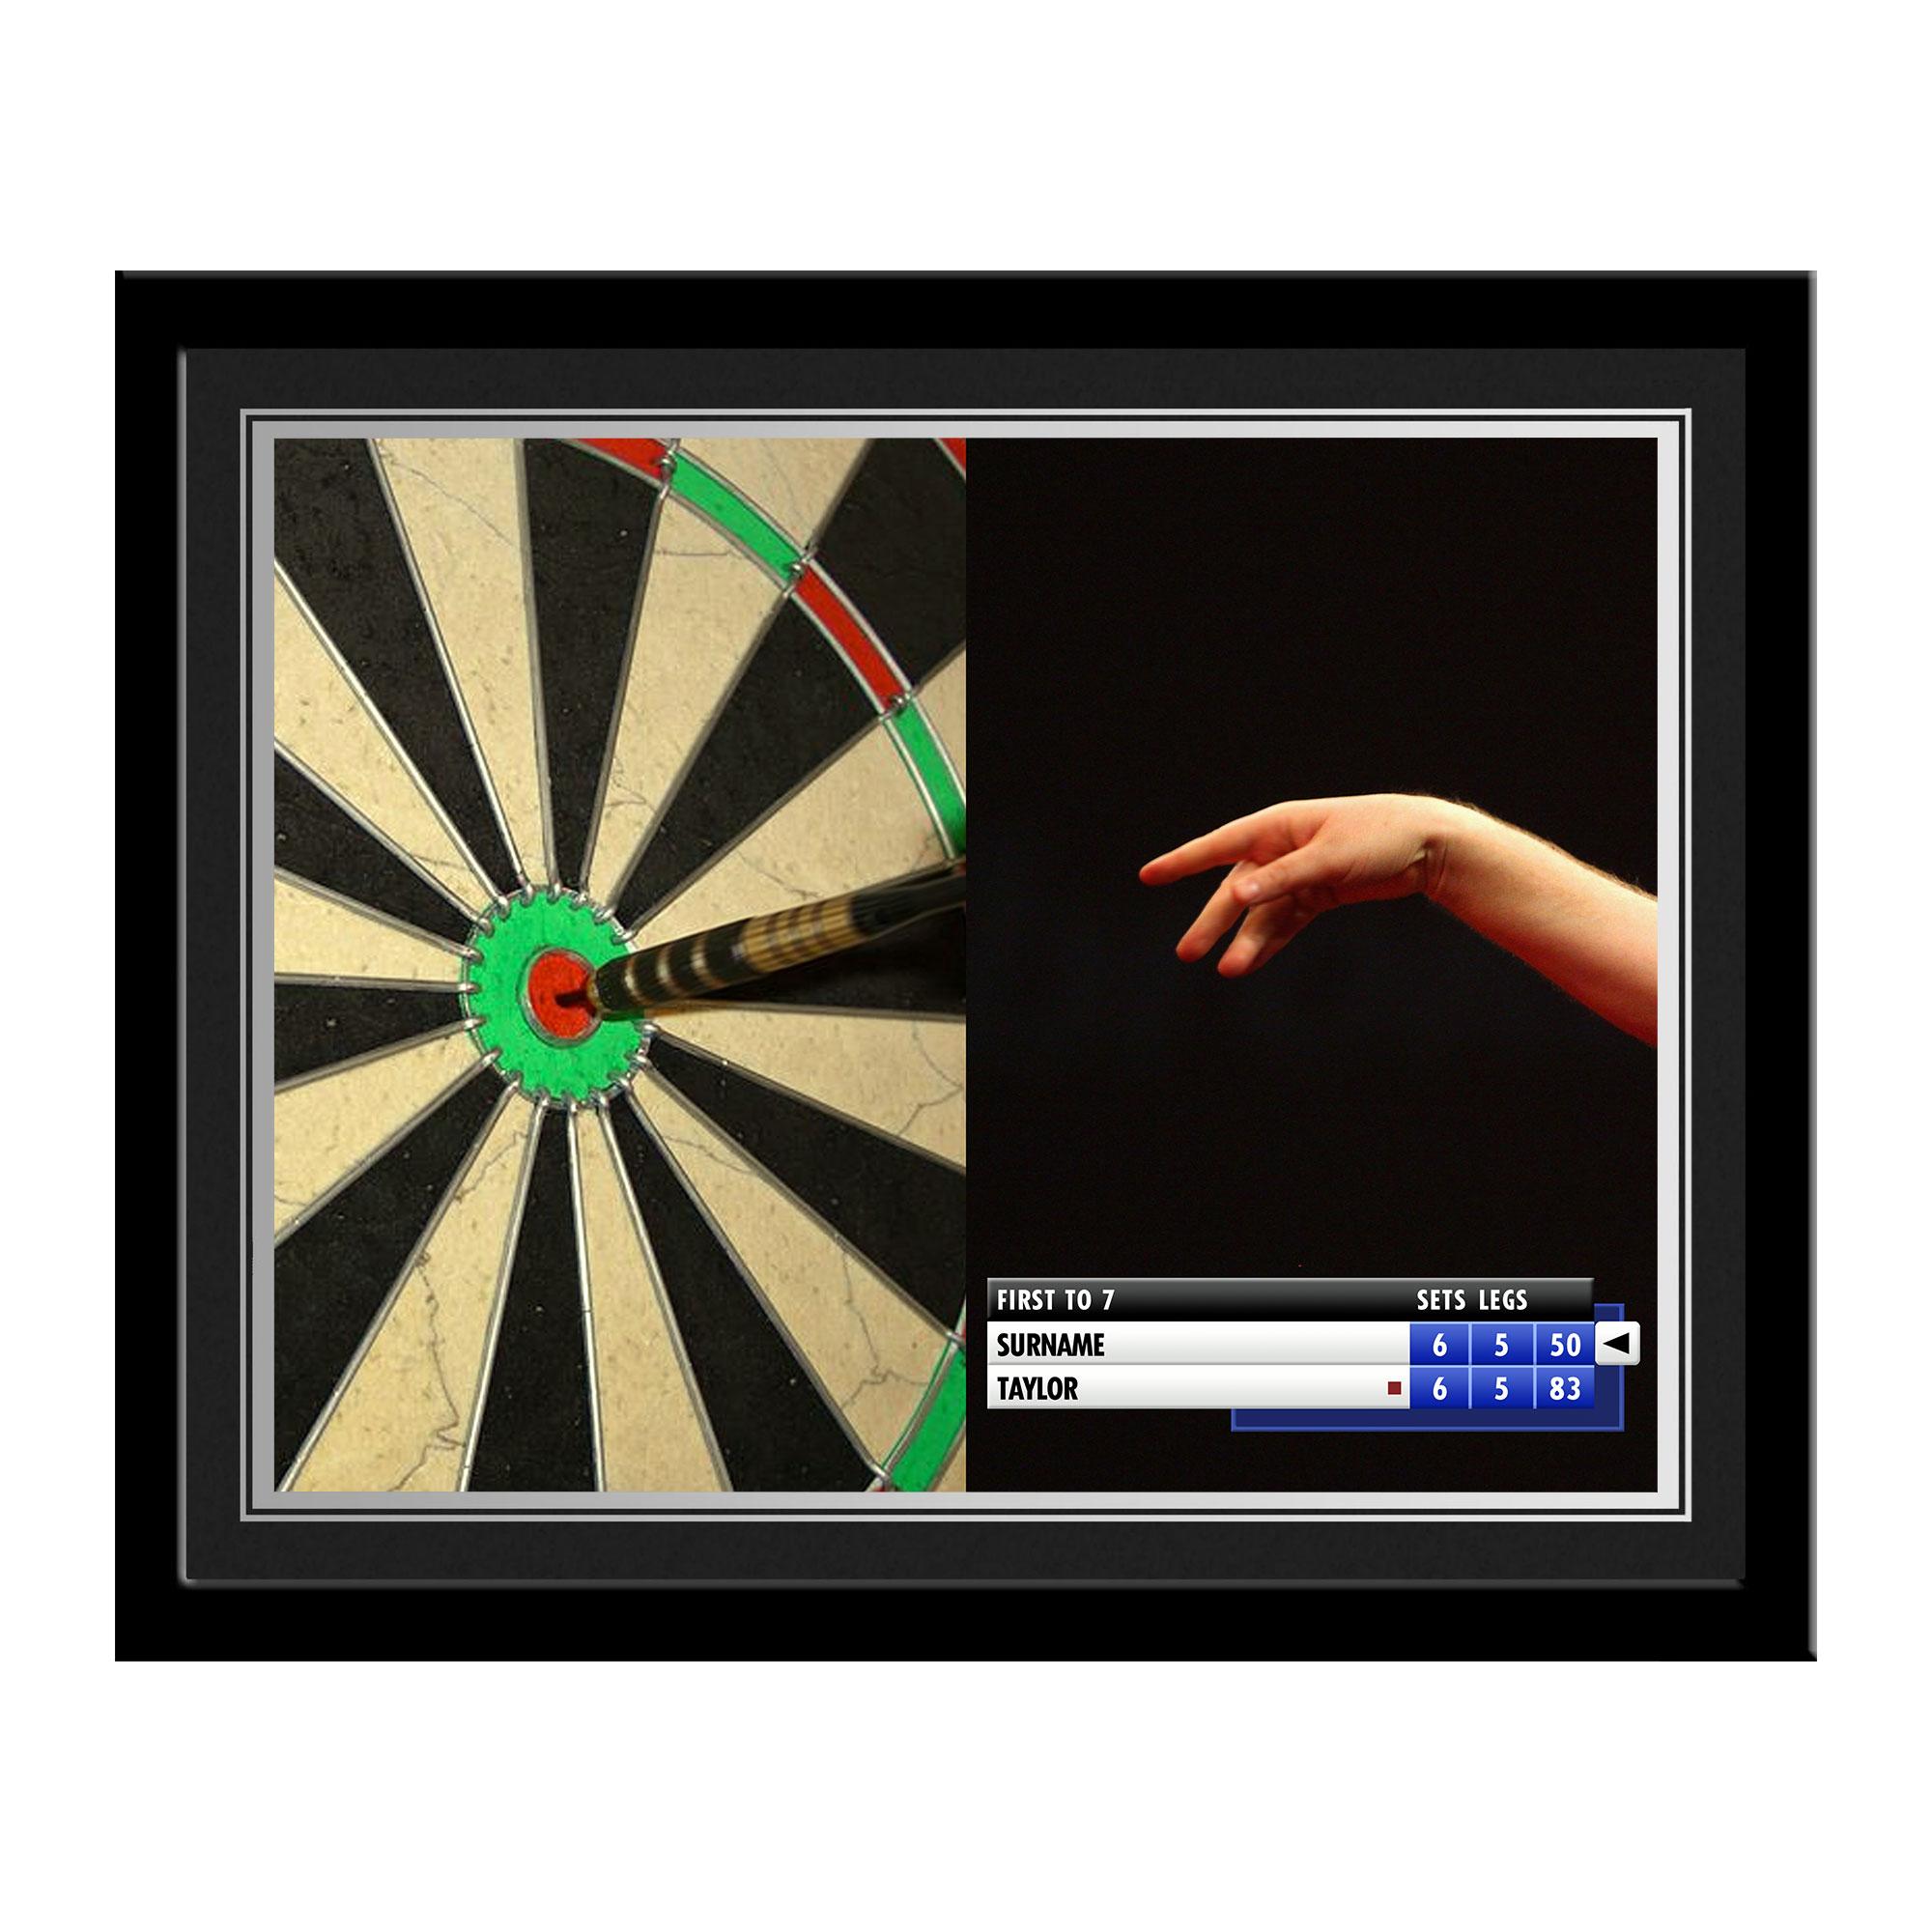 Personalised Darts Photo Frame